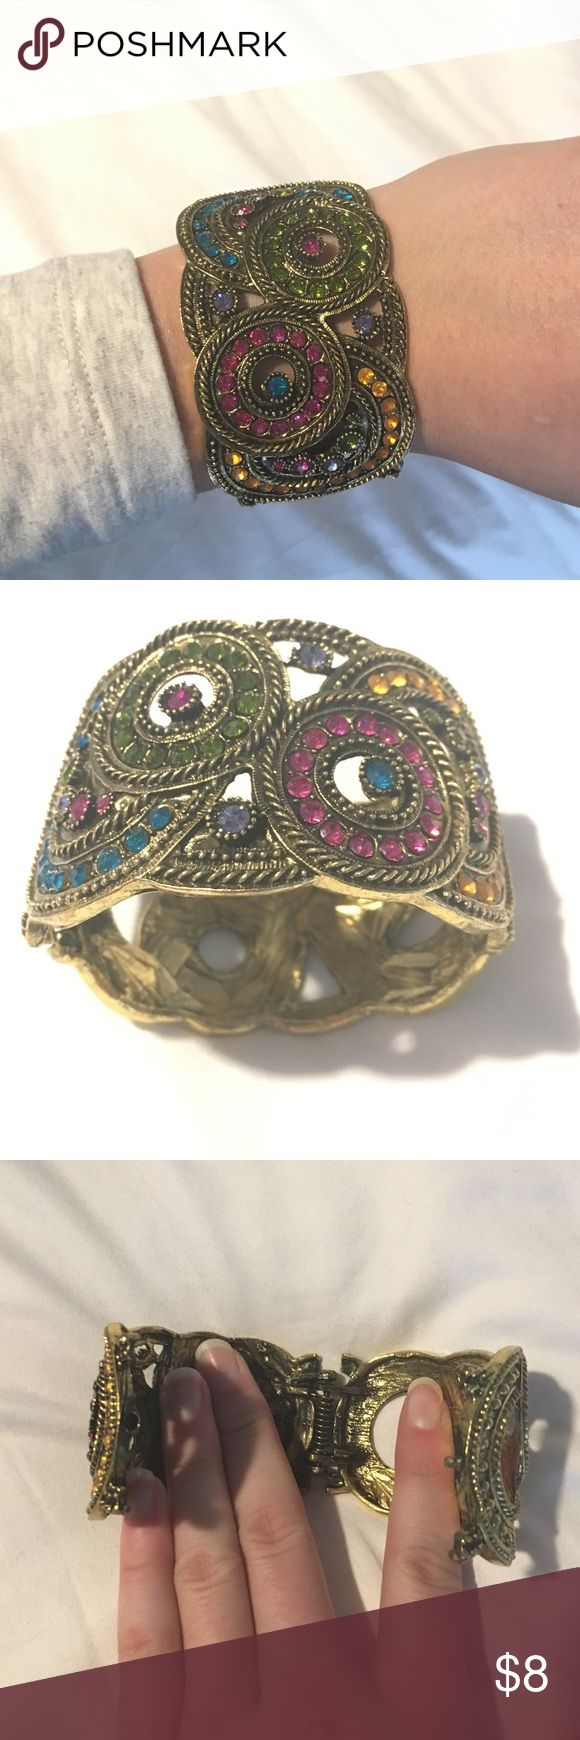 Multicolored rhinestone hinged bracelet Hinge is spring loaded. Missing one unnoticeable turquoise rhinestone. Jewelry Bracelets